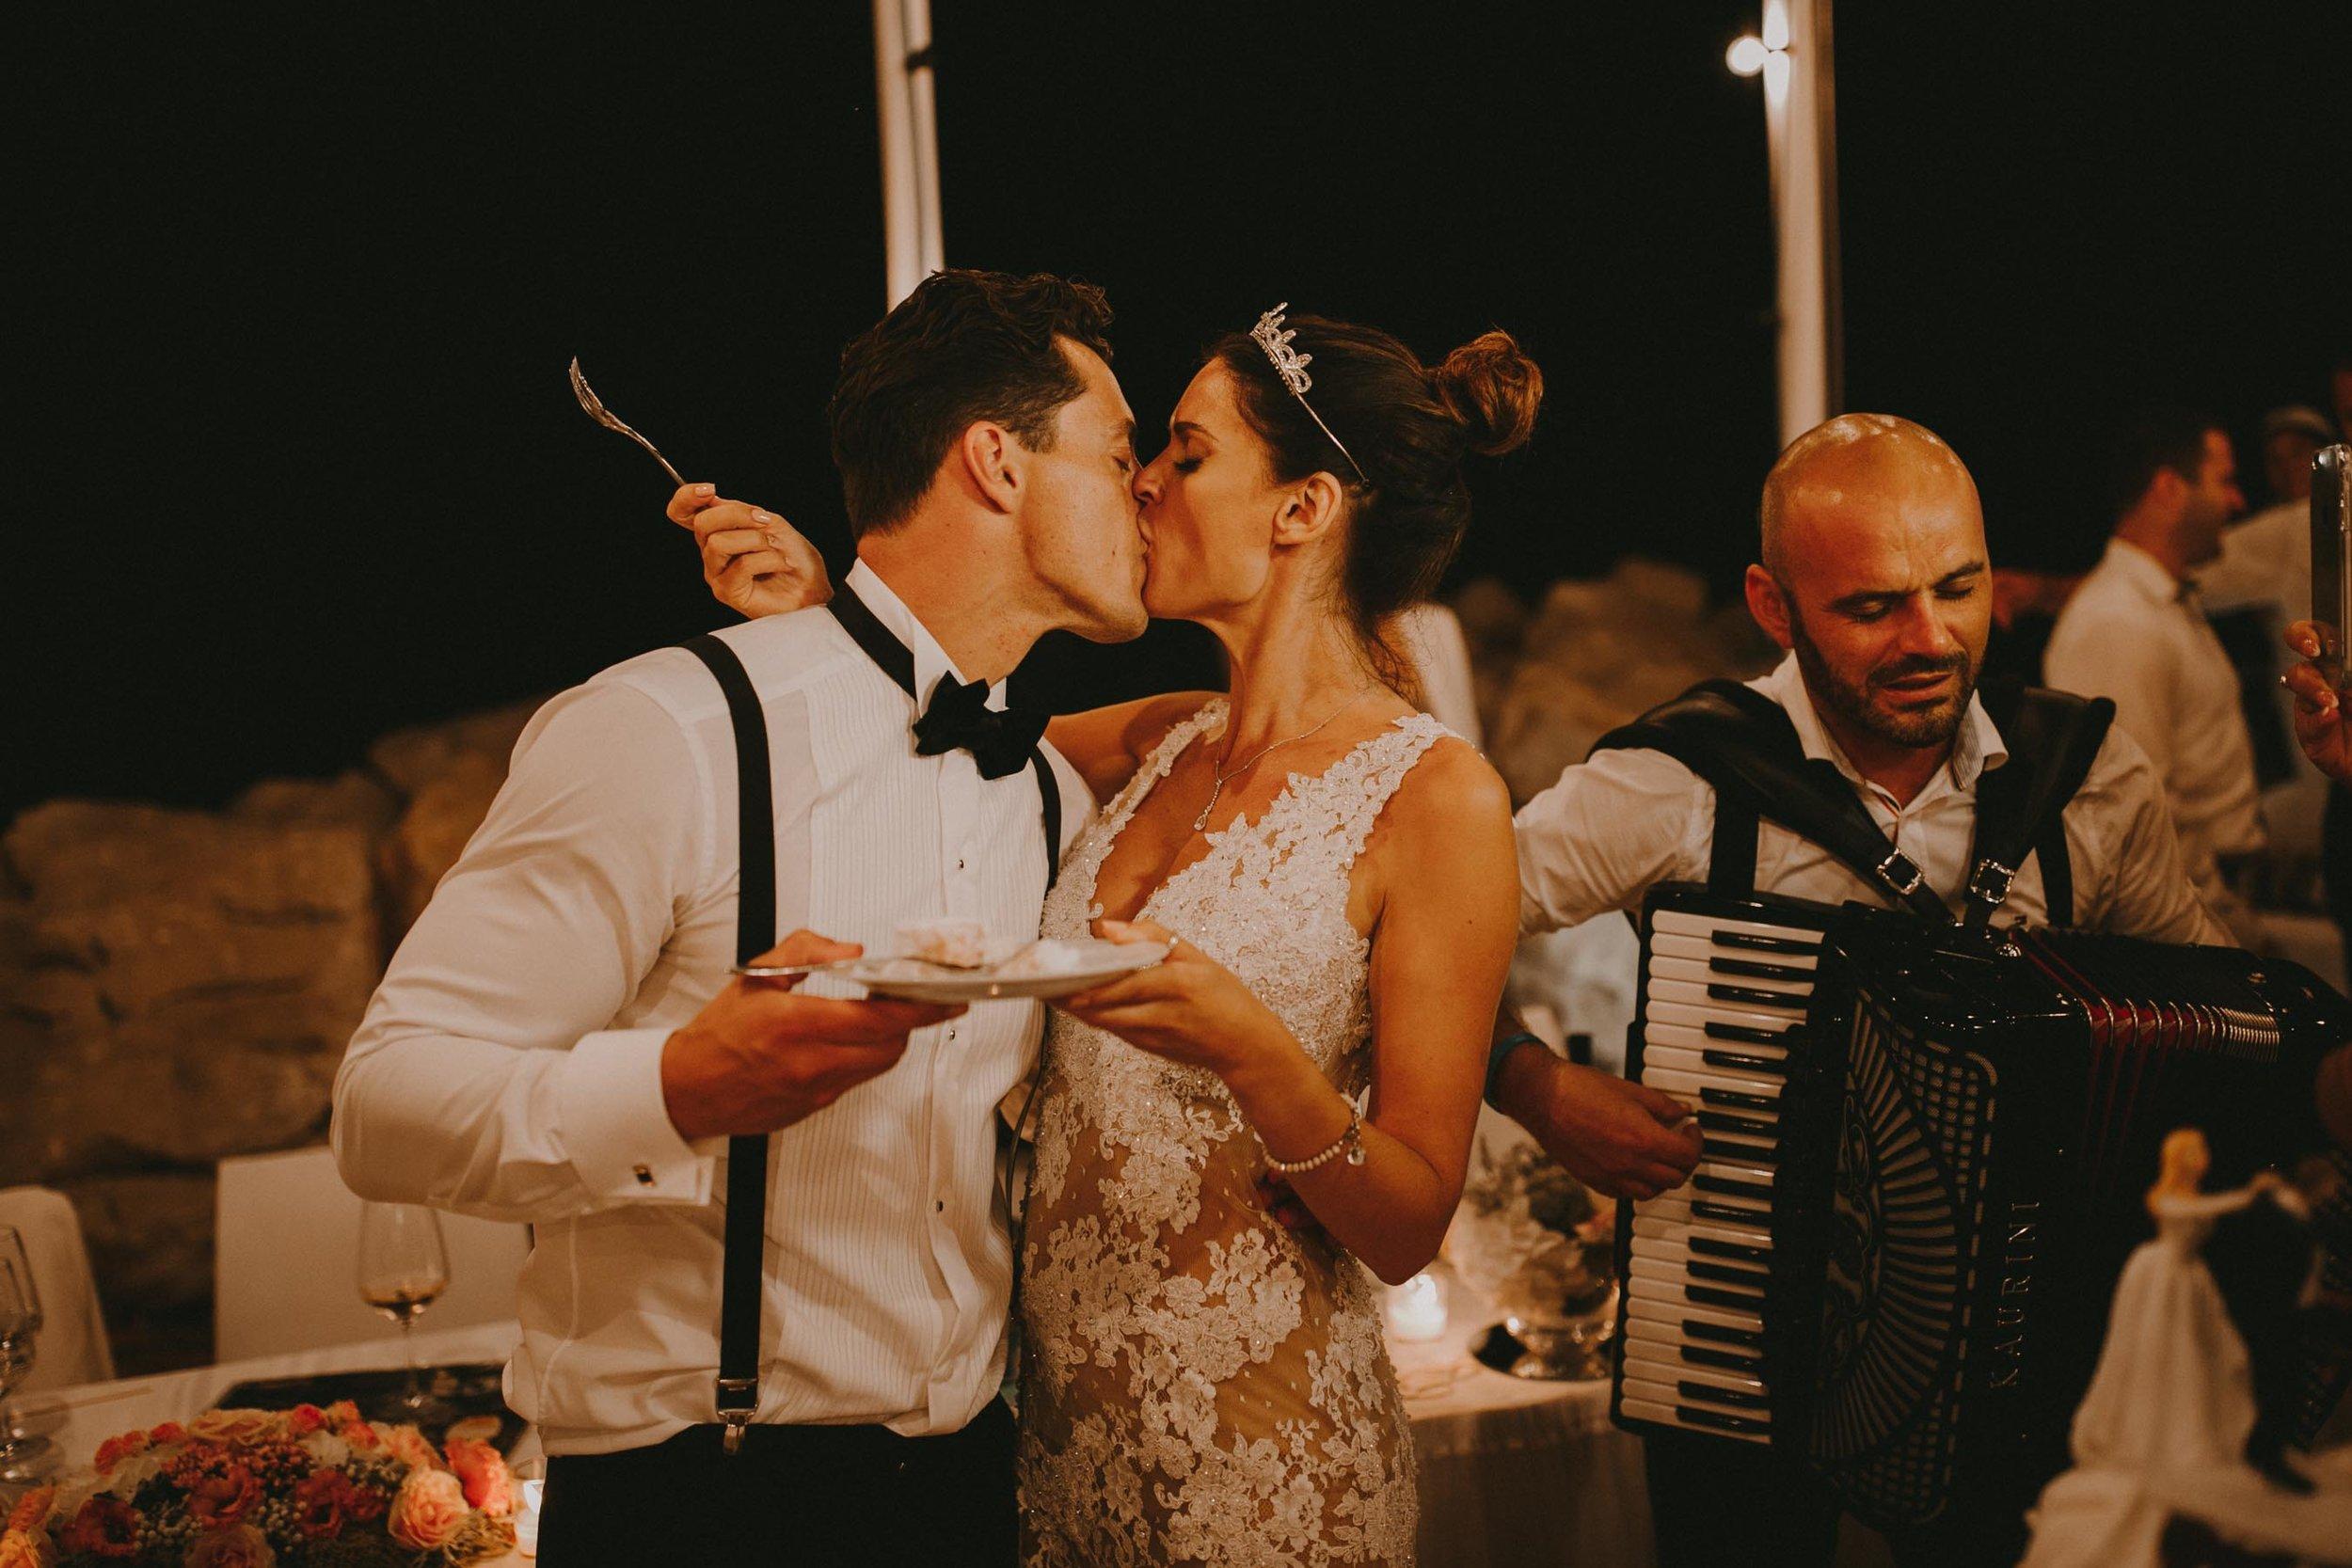 sylvia&dimitri-Wedding-Crvena_Luka-Croatia-129(0645).jpg